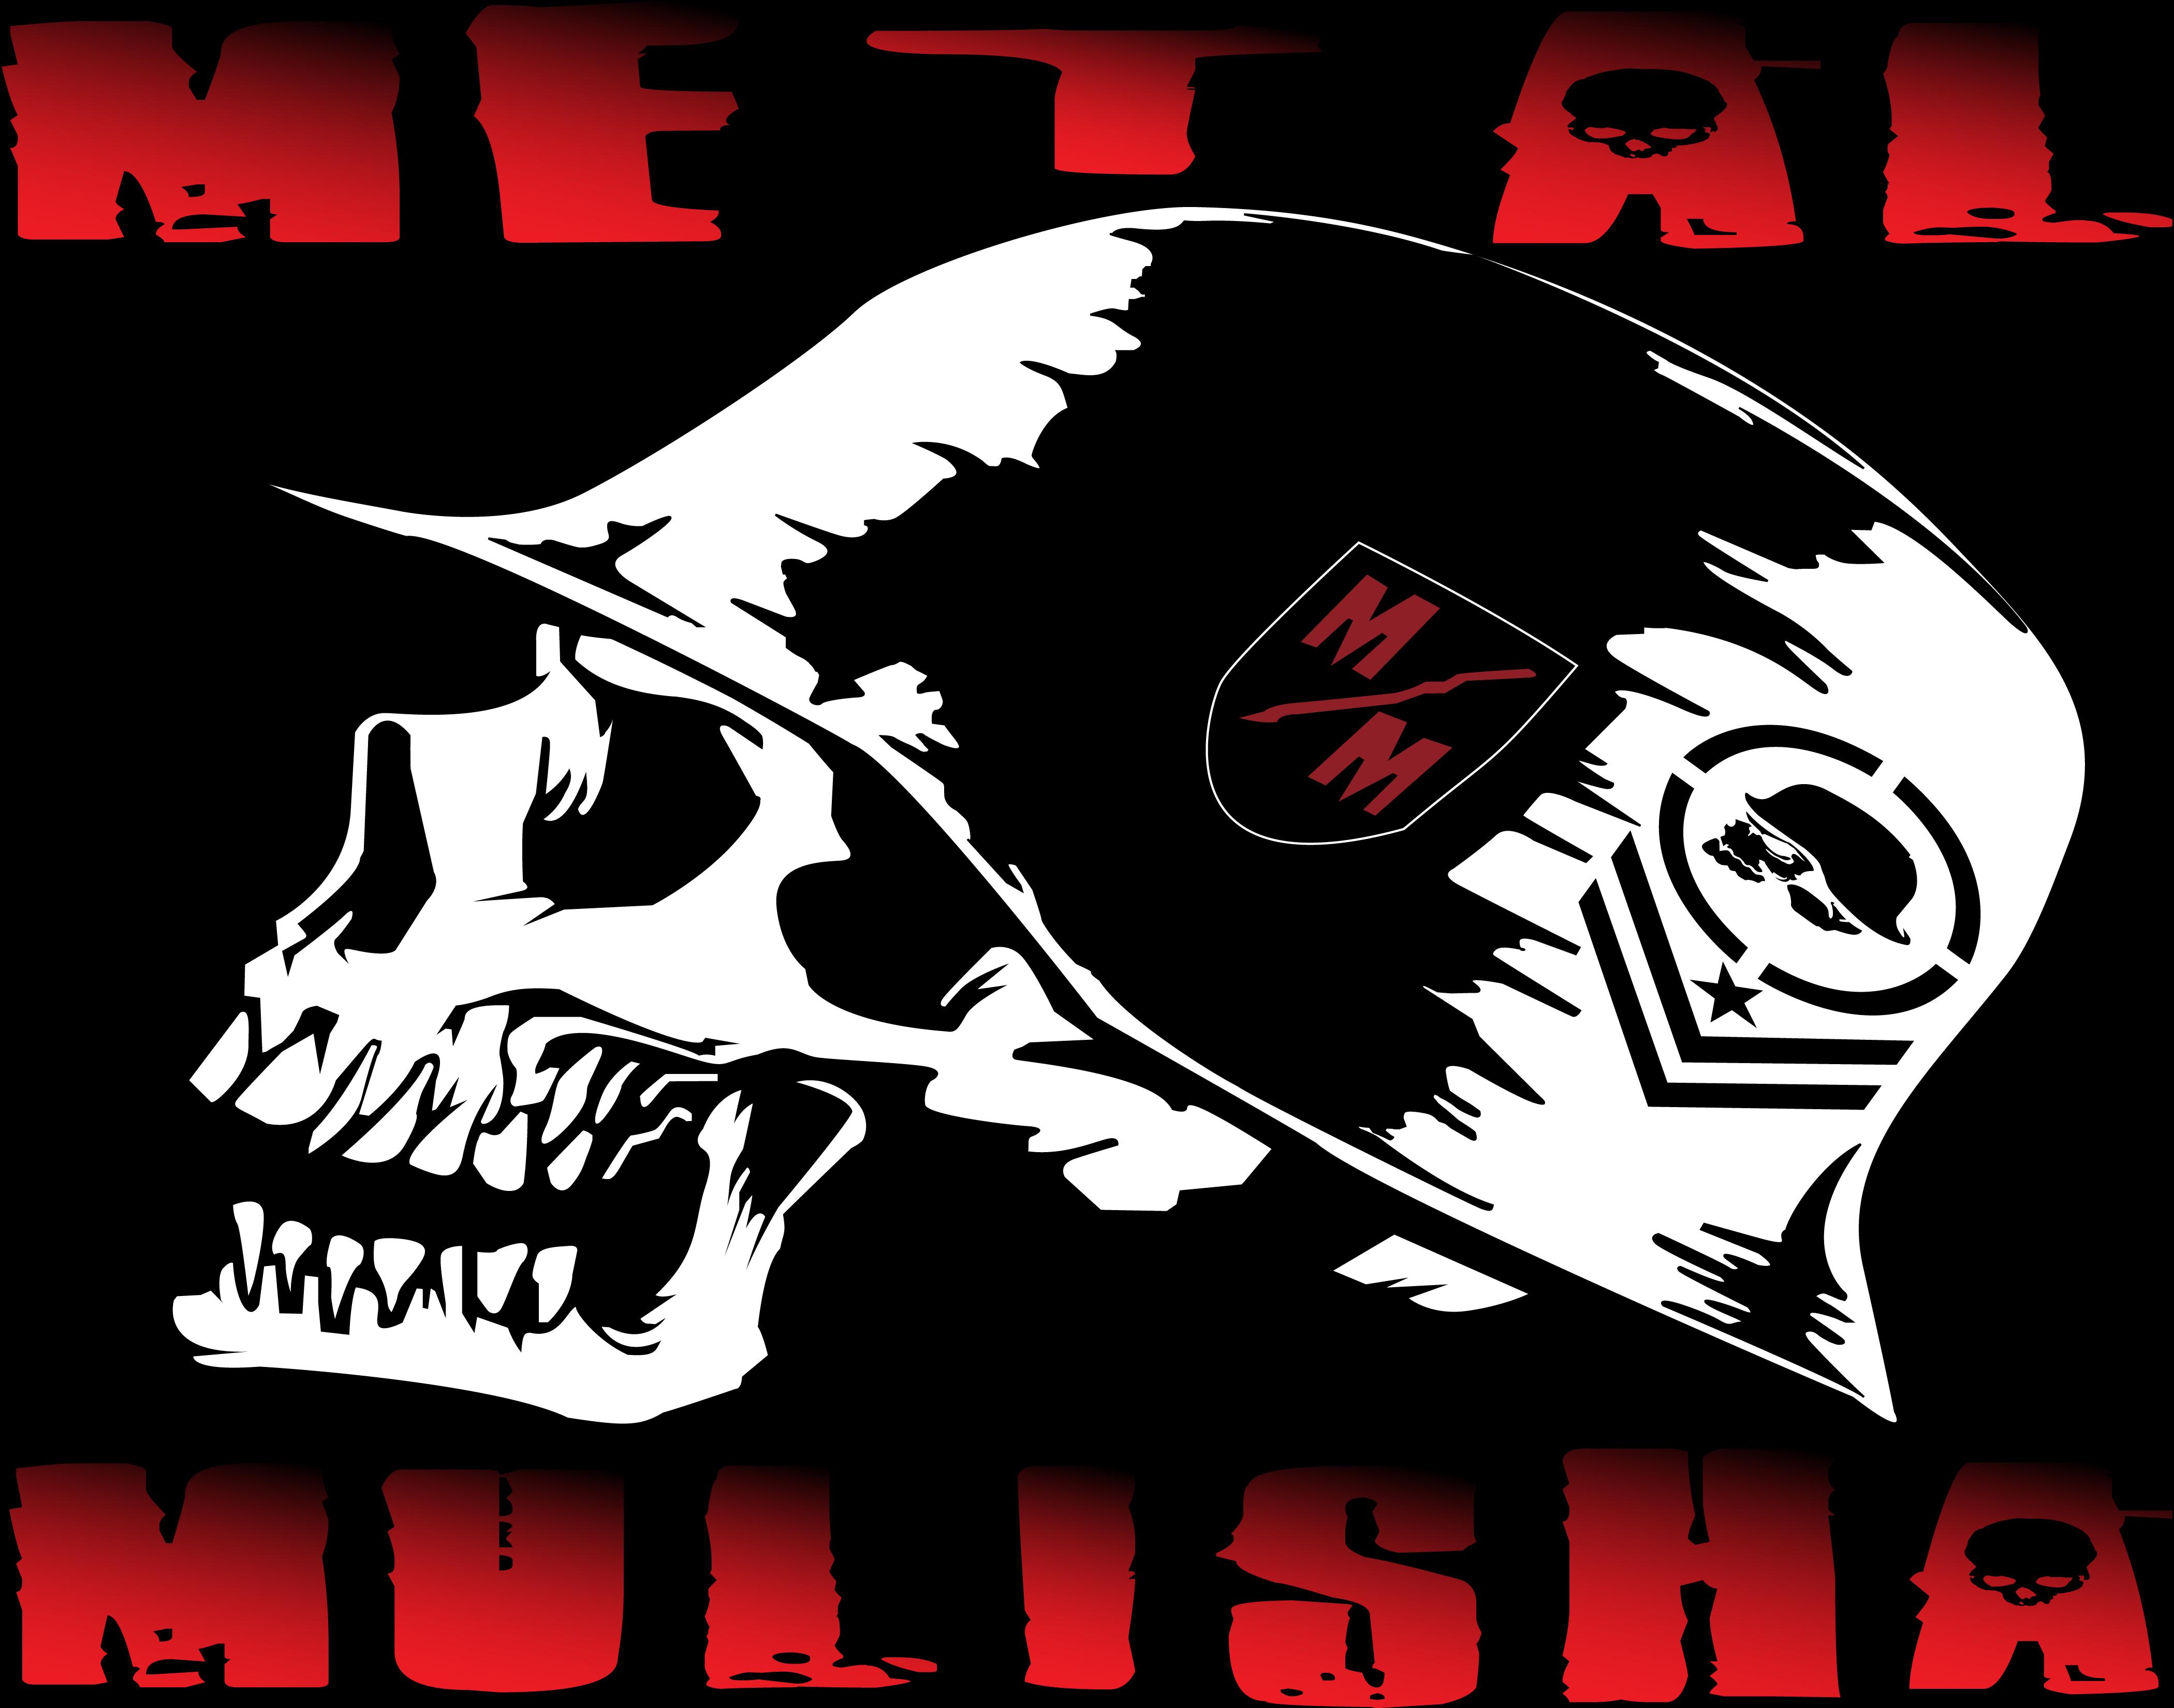 Metal Mulisha Wallpaper HD